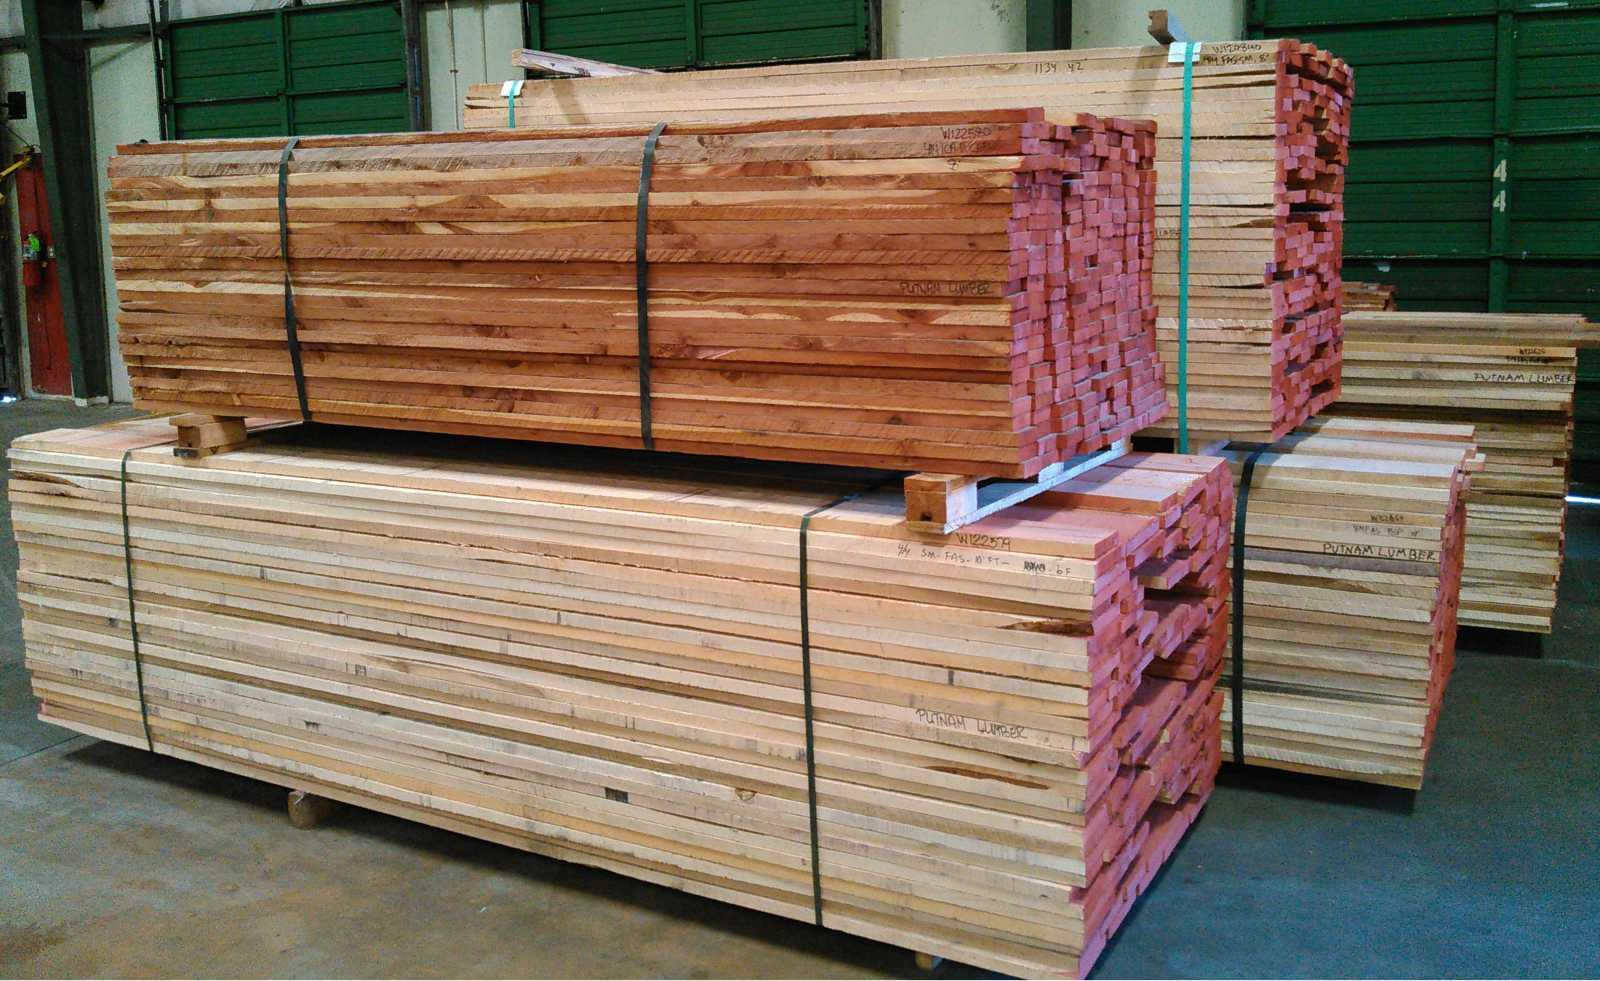 Lumber plywood osb rail road ties construction materials